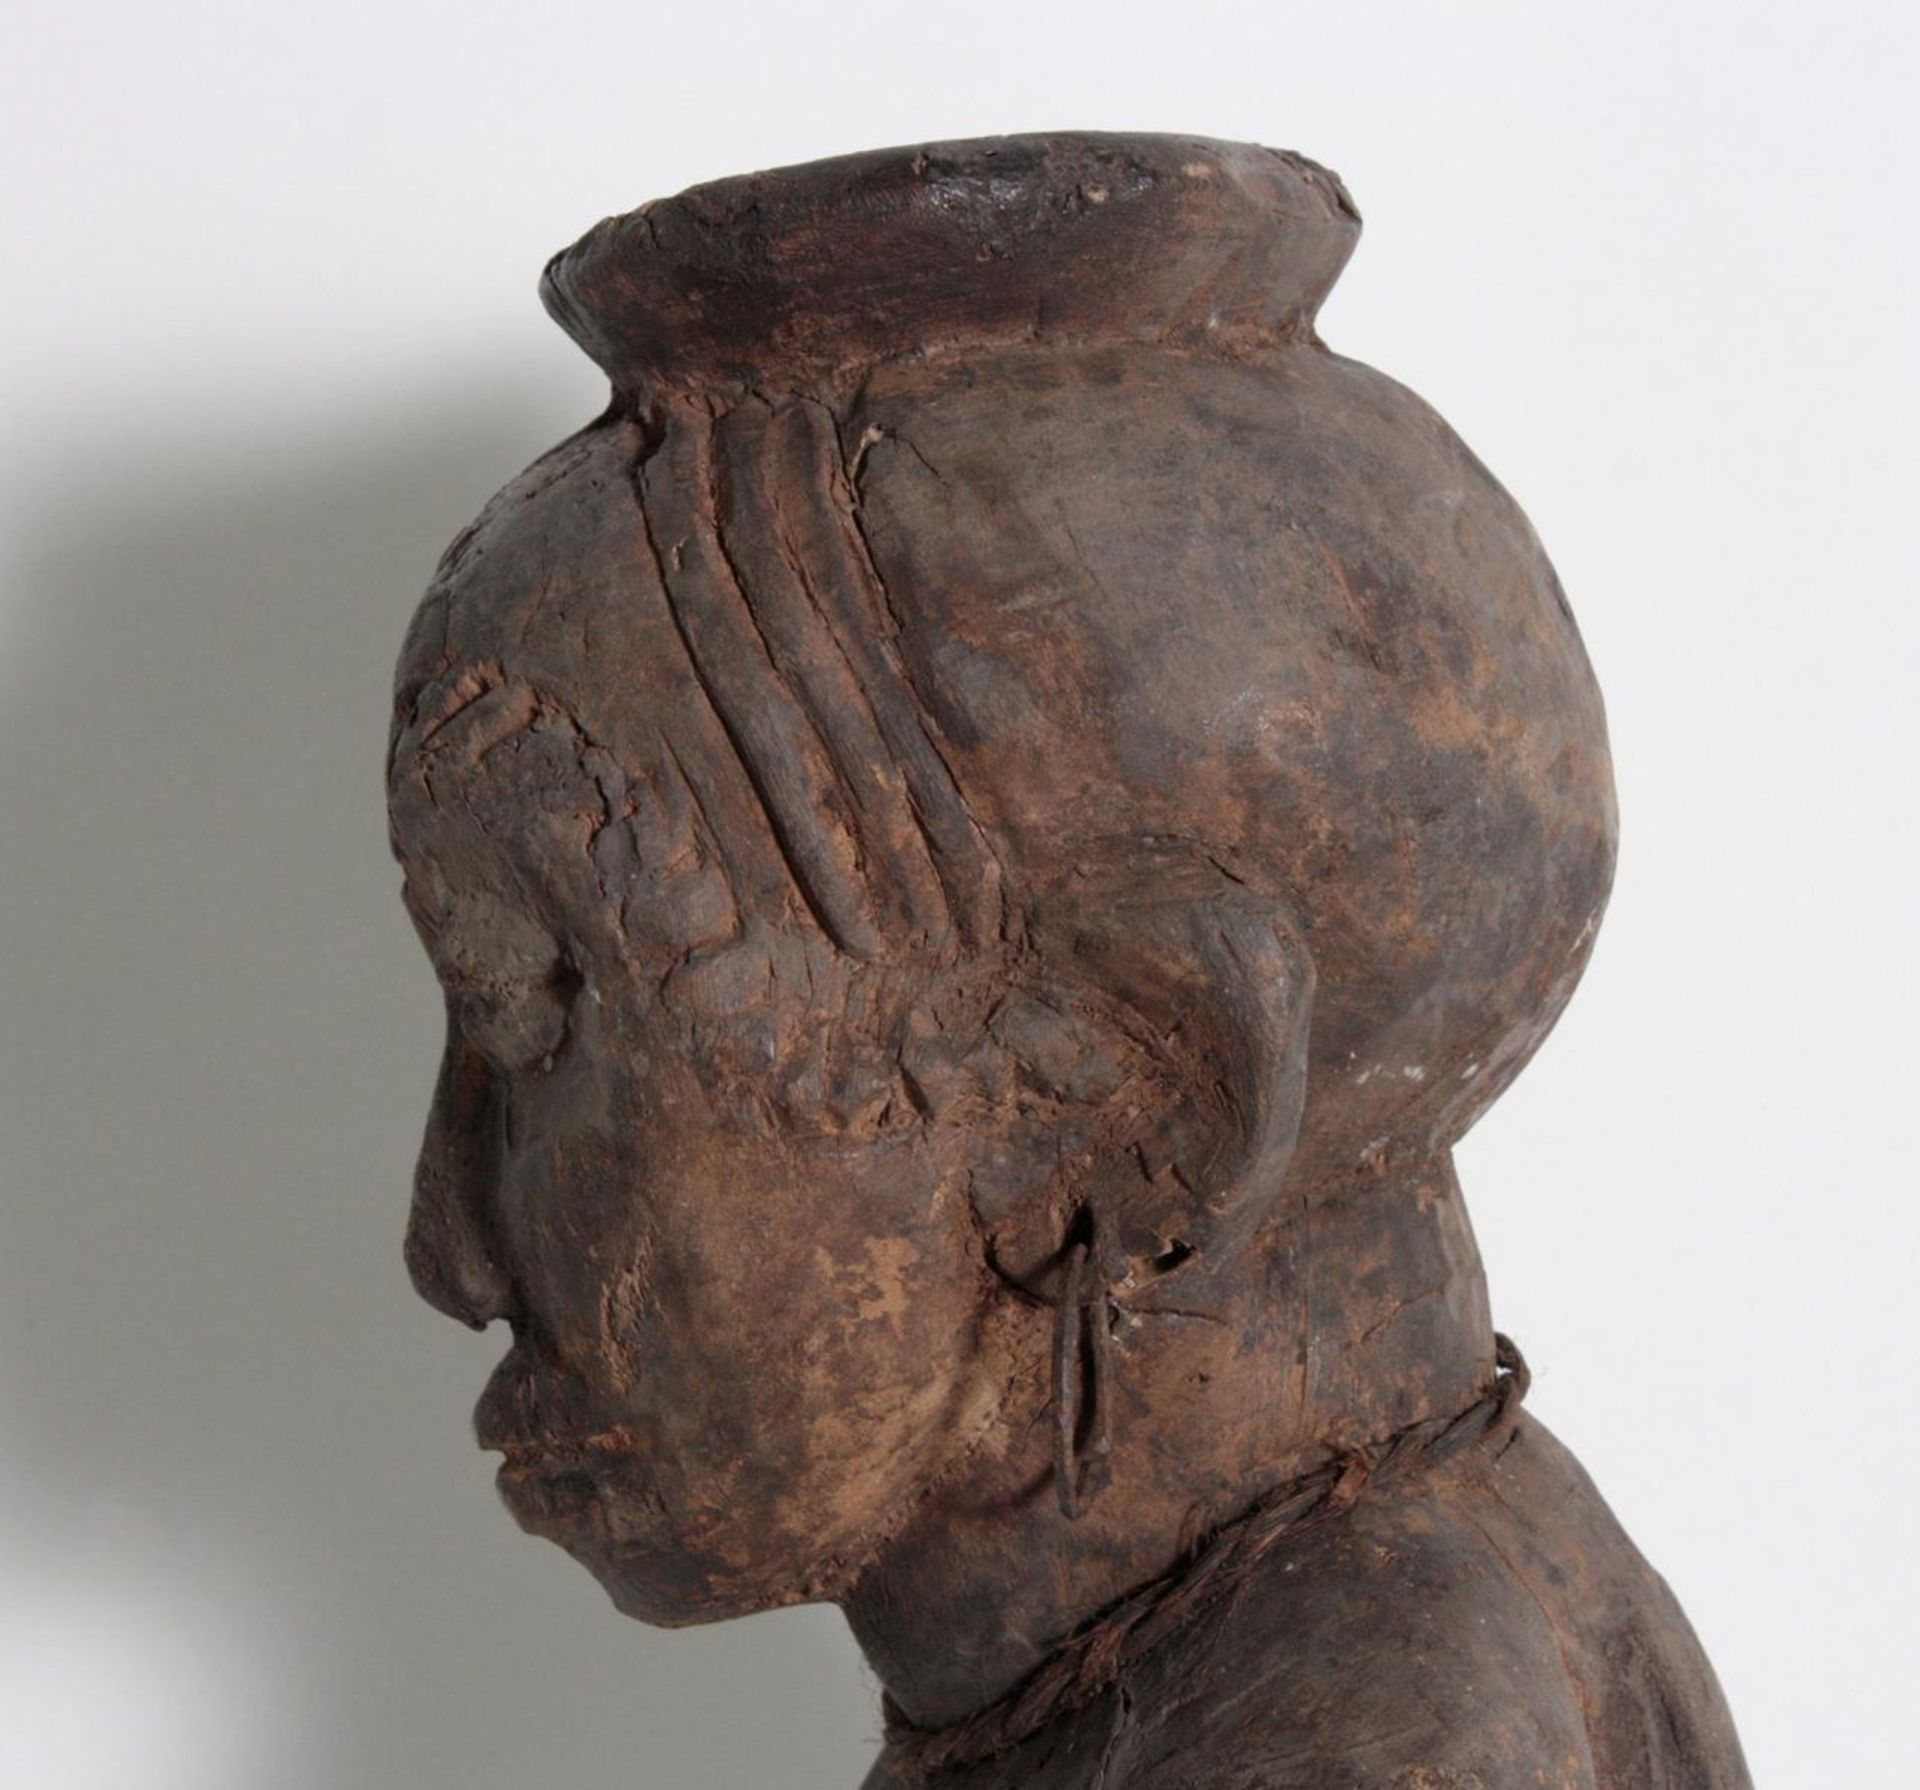 Ältere Ahnen-Figur, Tabwa, D. R. Kongo - Bild 6 aus 14